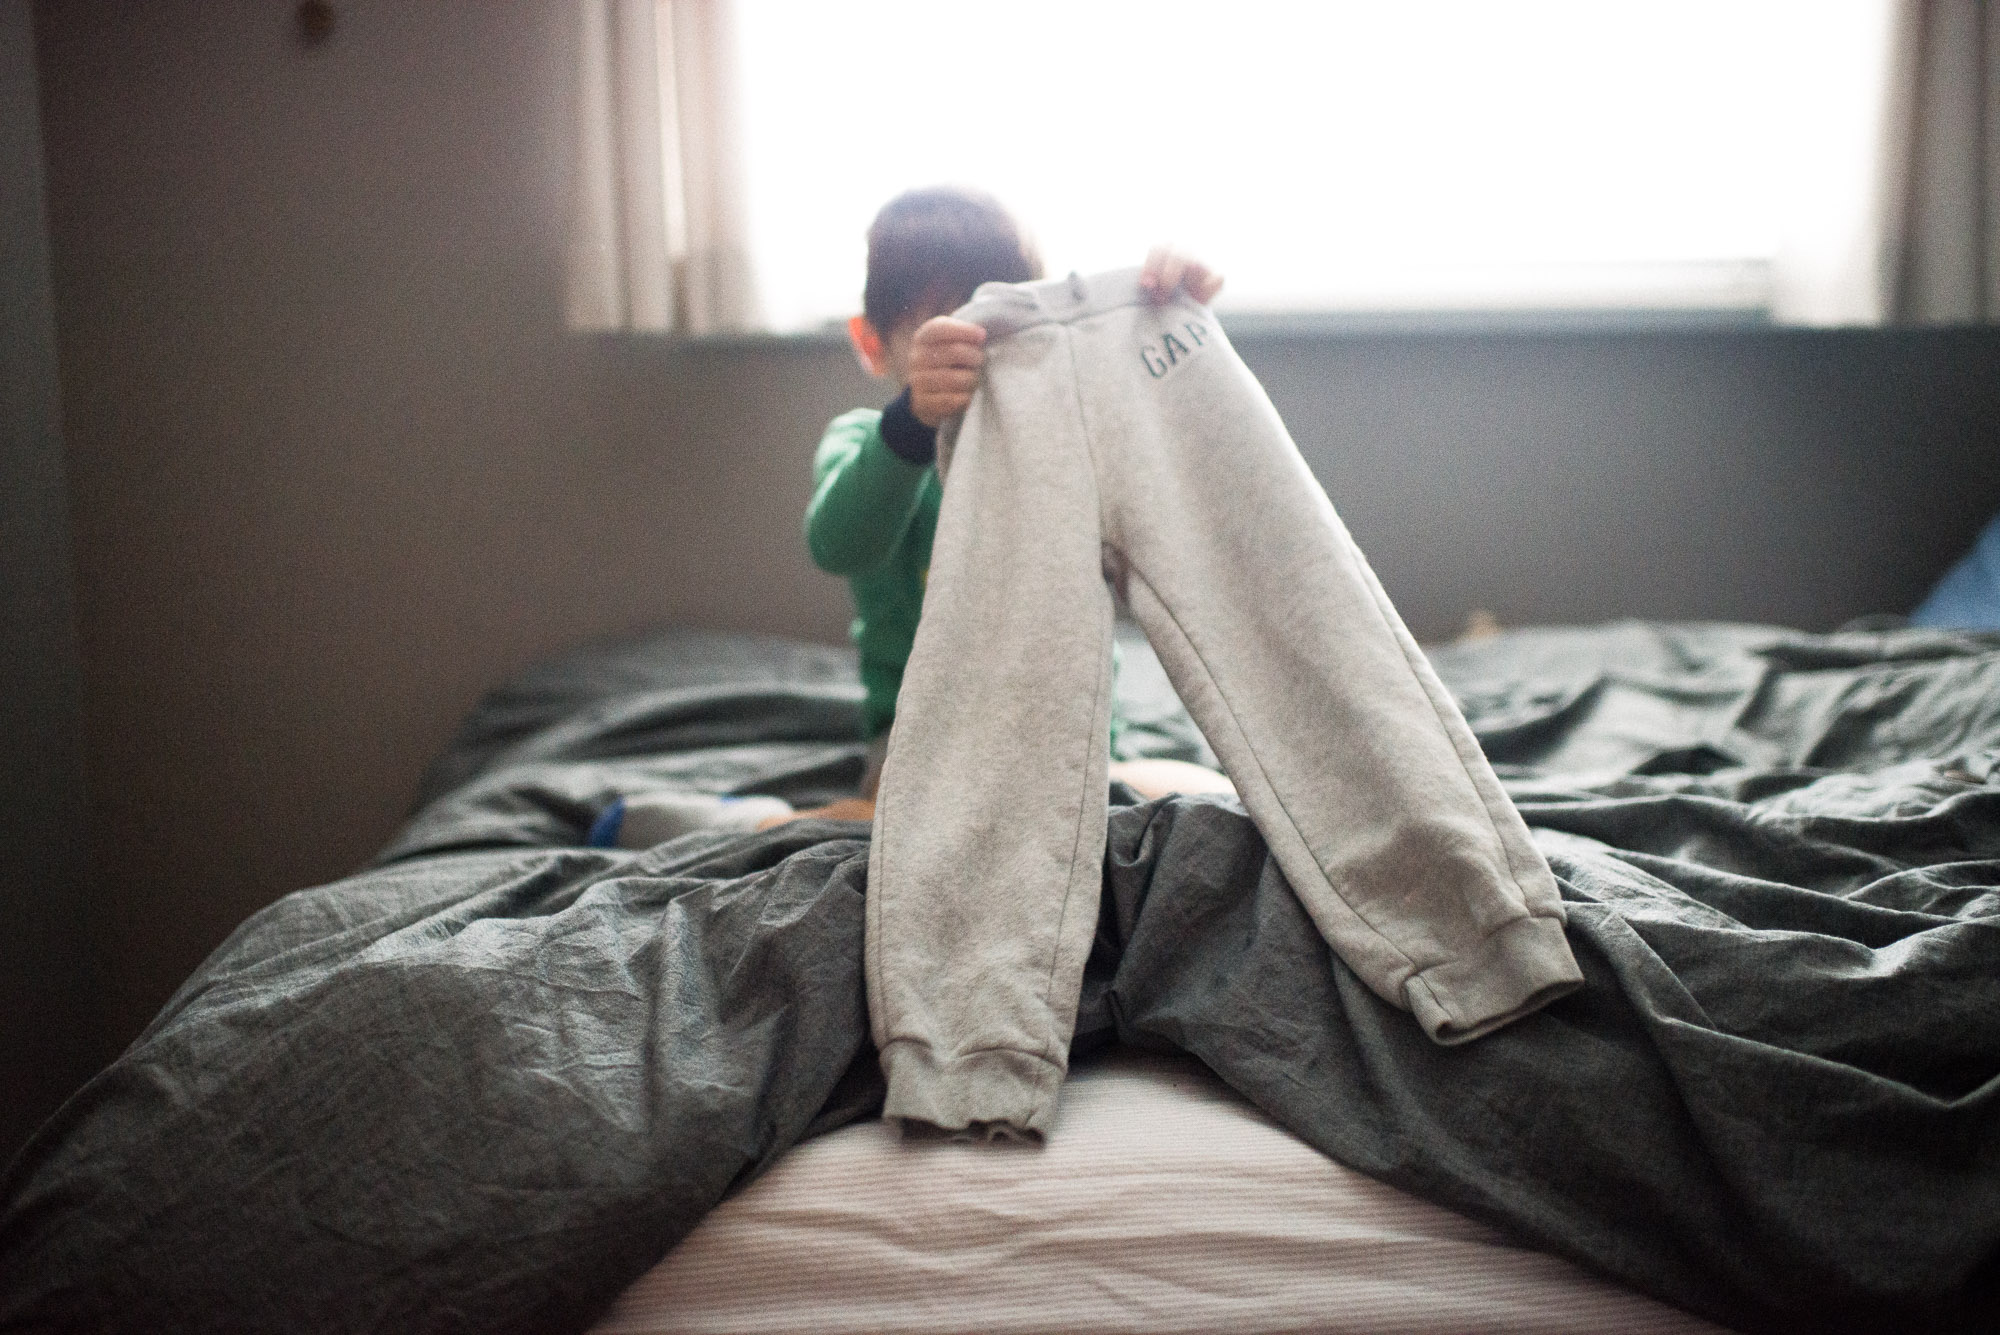 boy holds up pants